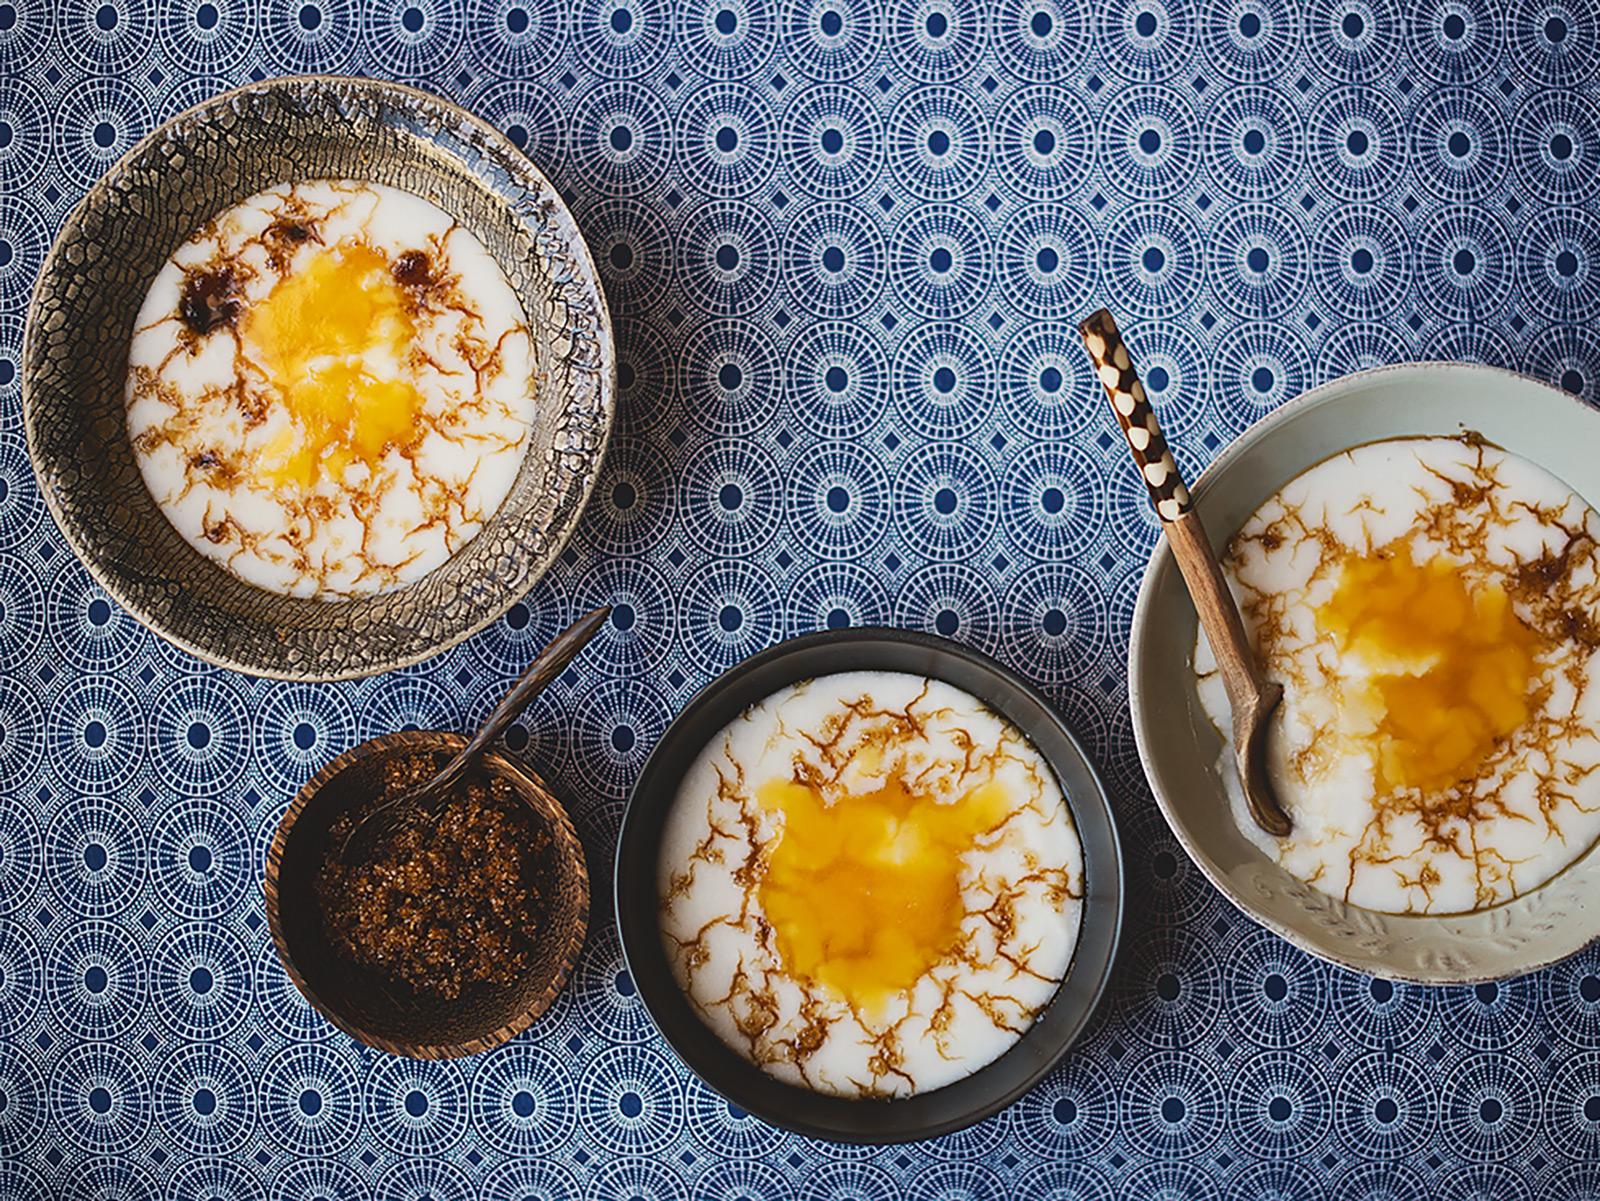 mealie-pap-bowls.jpg